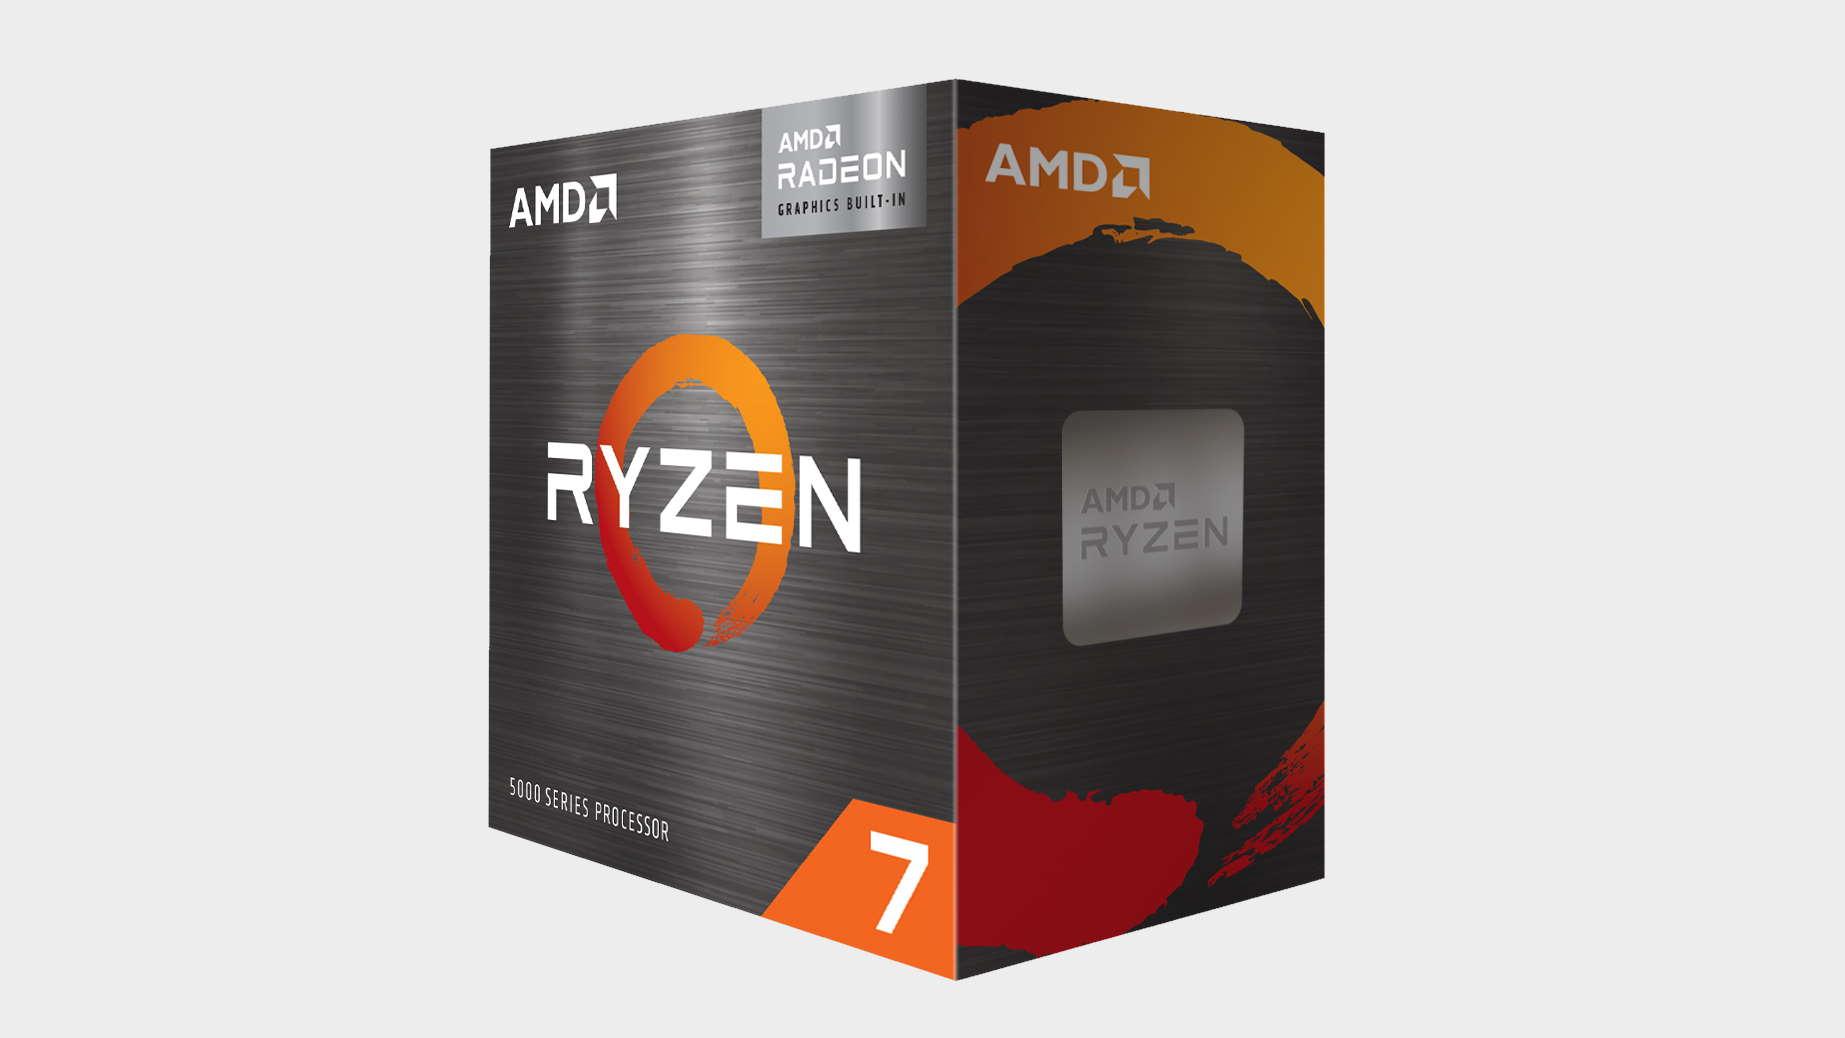 AMD Ryzen 7 5700G in its packaging on a grey background